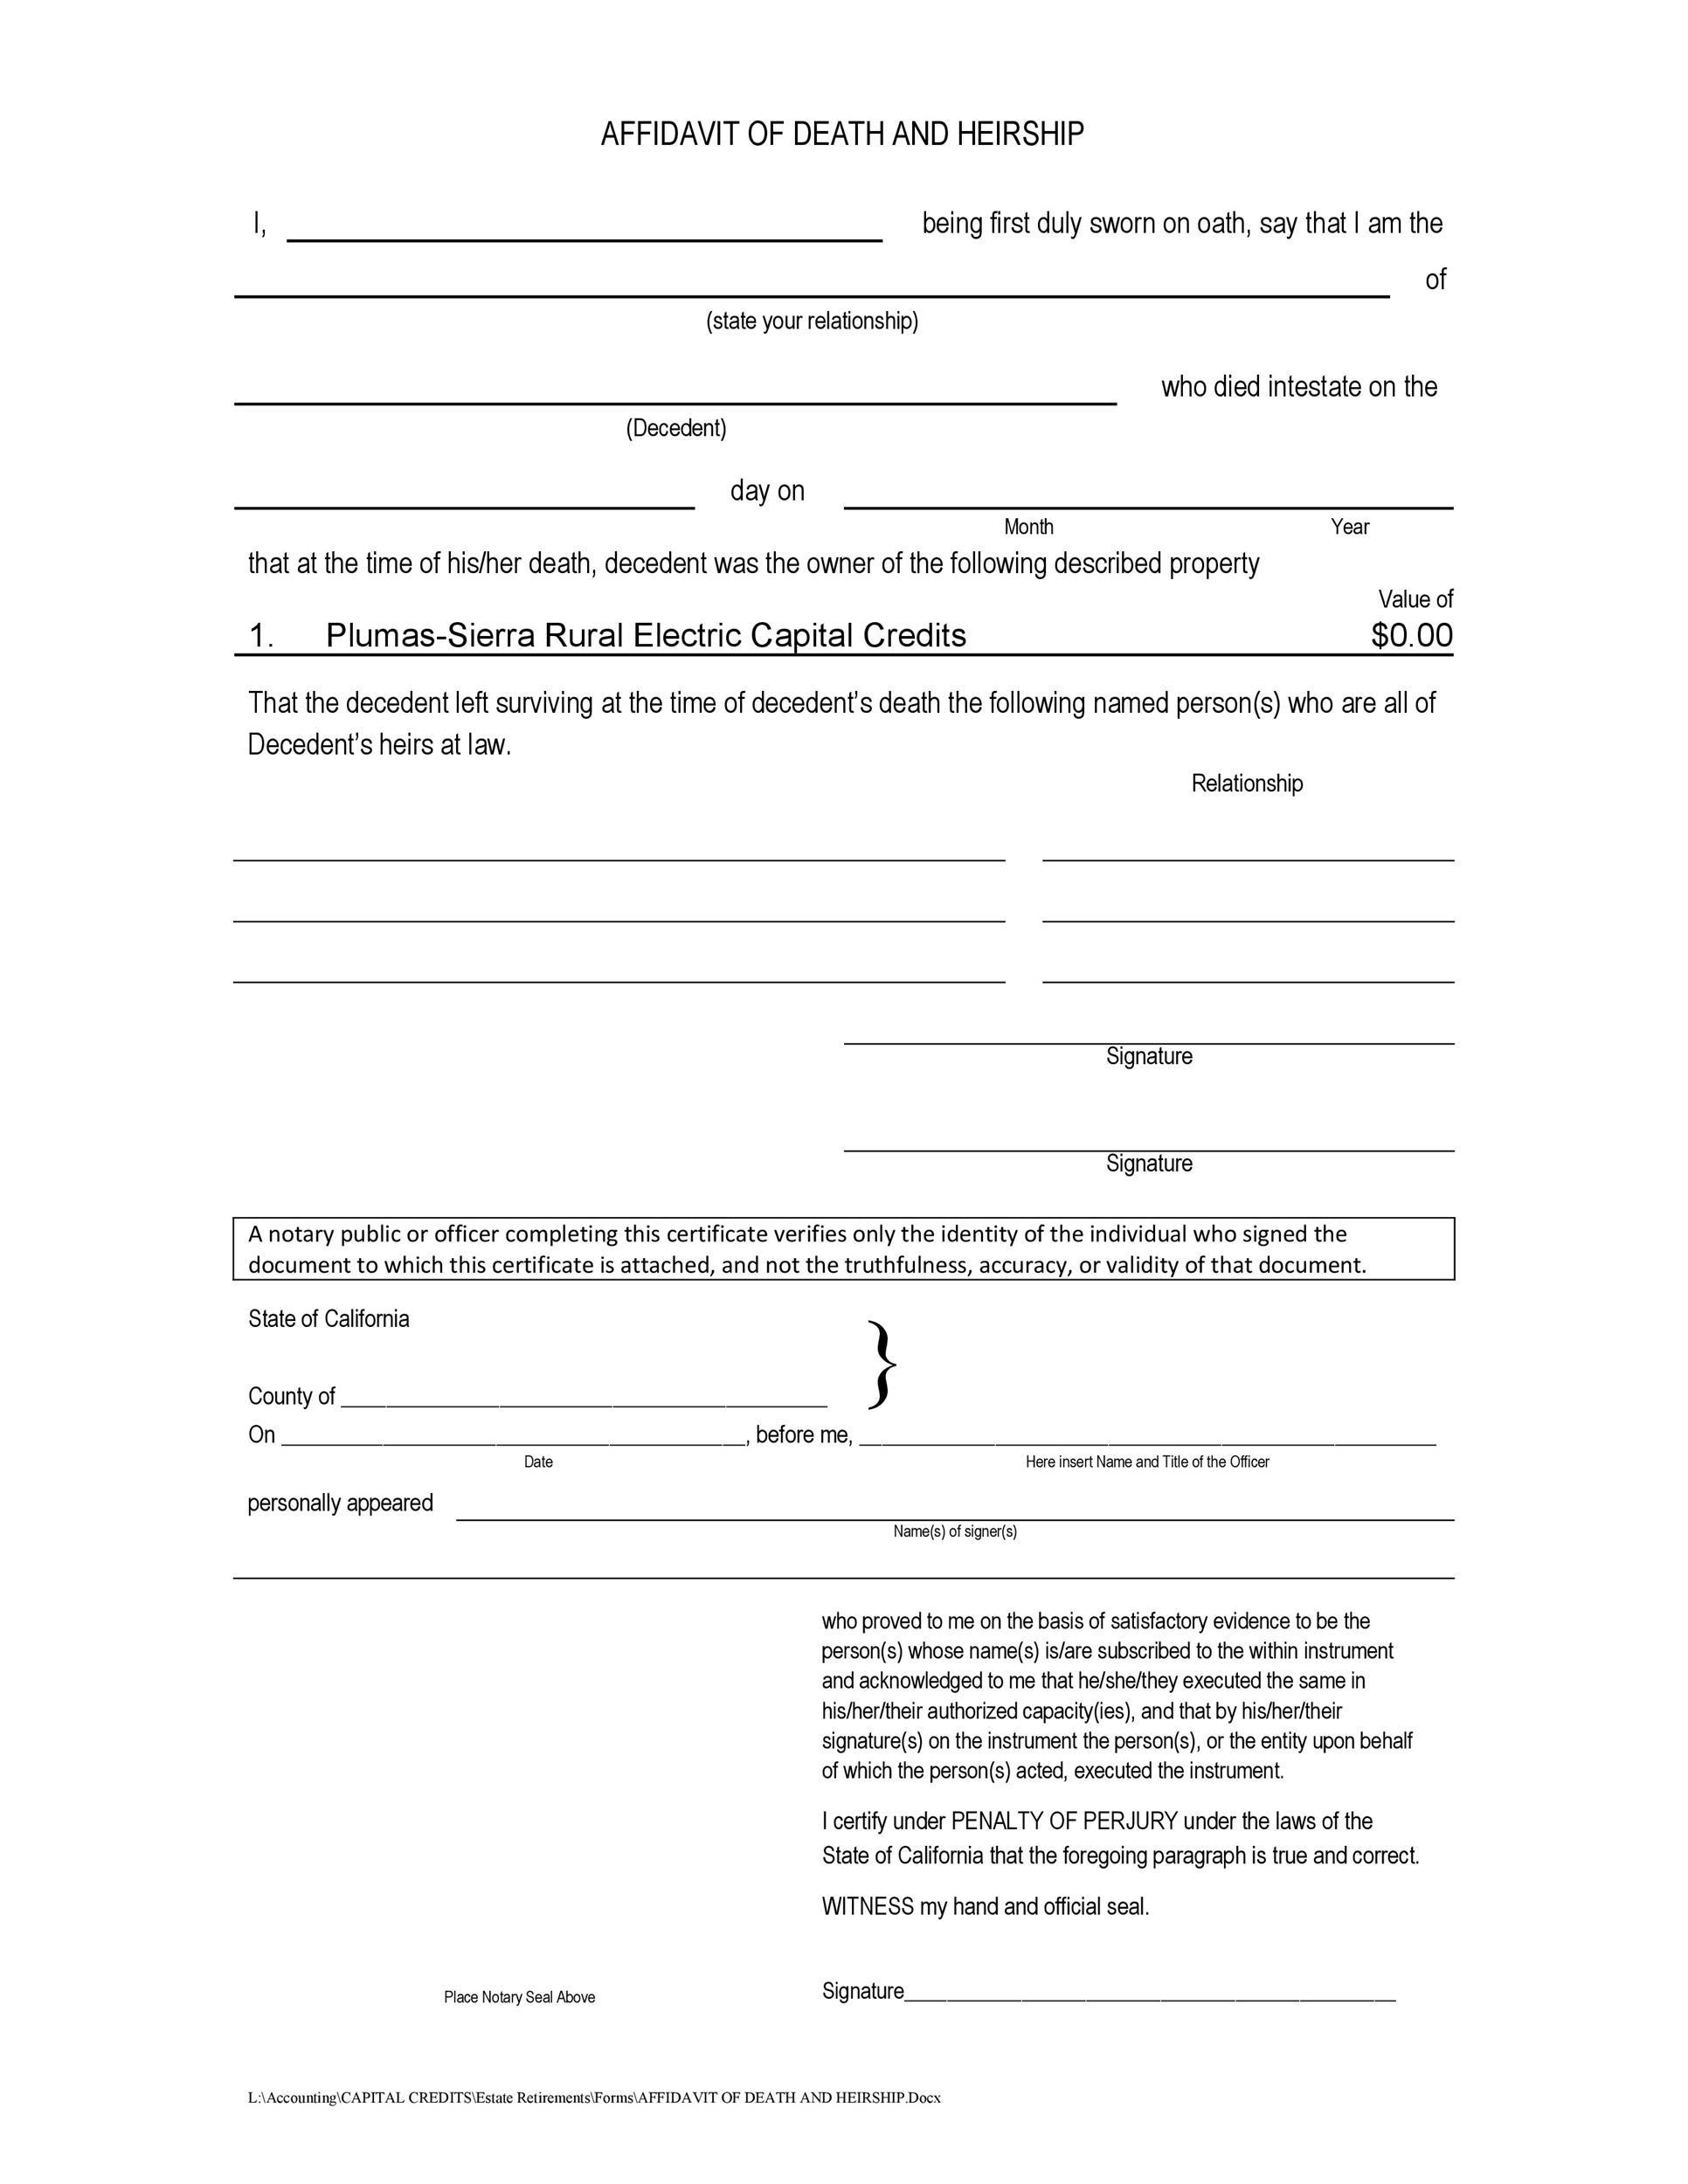 Free affidavit of death 44